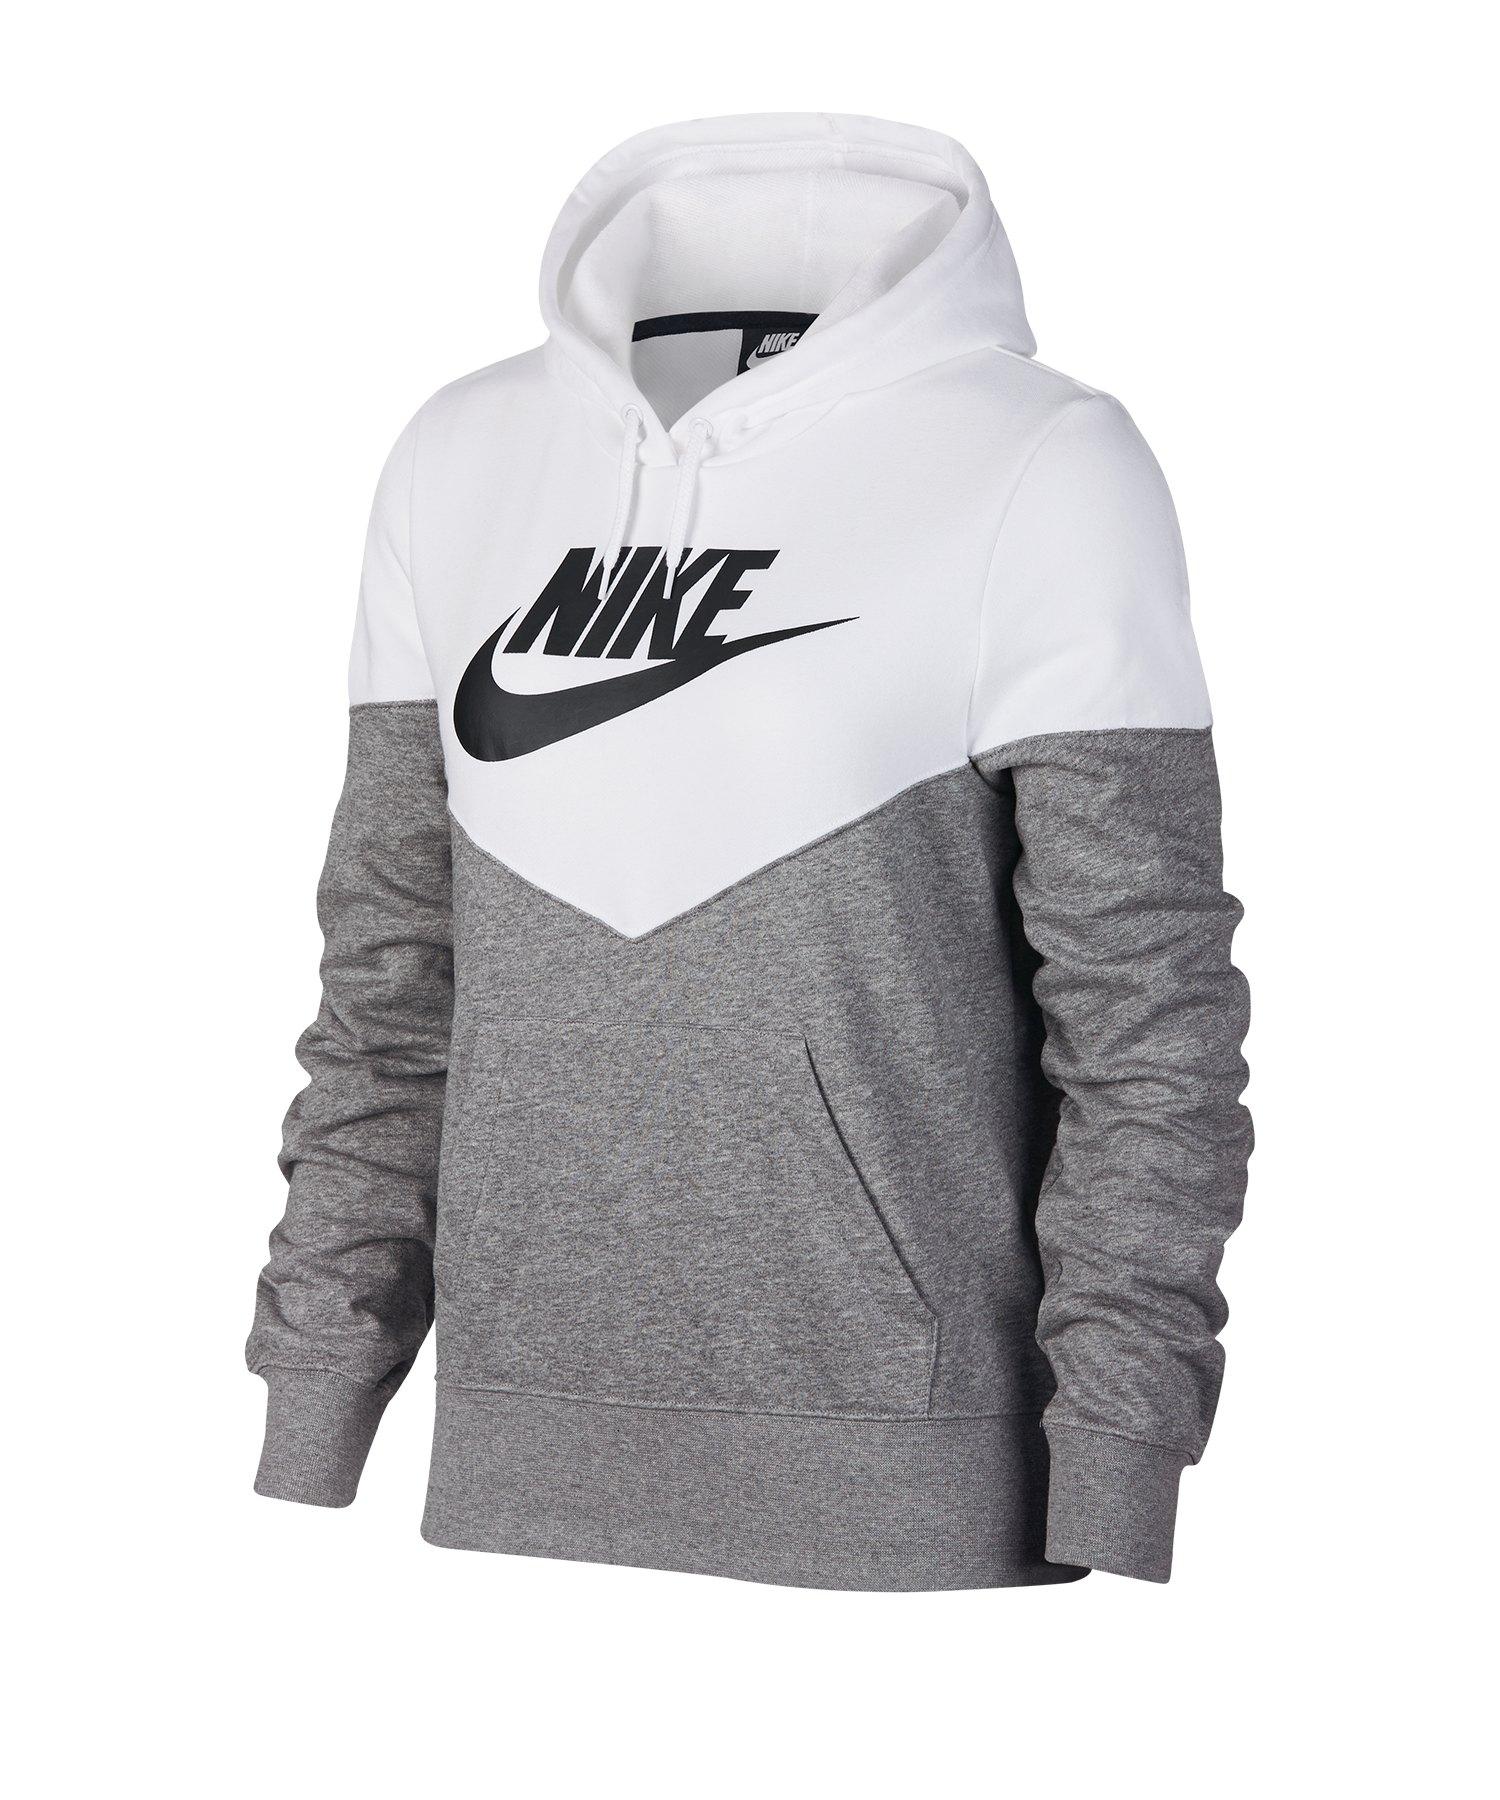 online store 3aa97 b9776 Nike Heritage Kapuzenpullover Fleece Damen F064